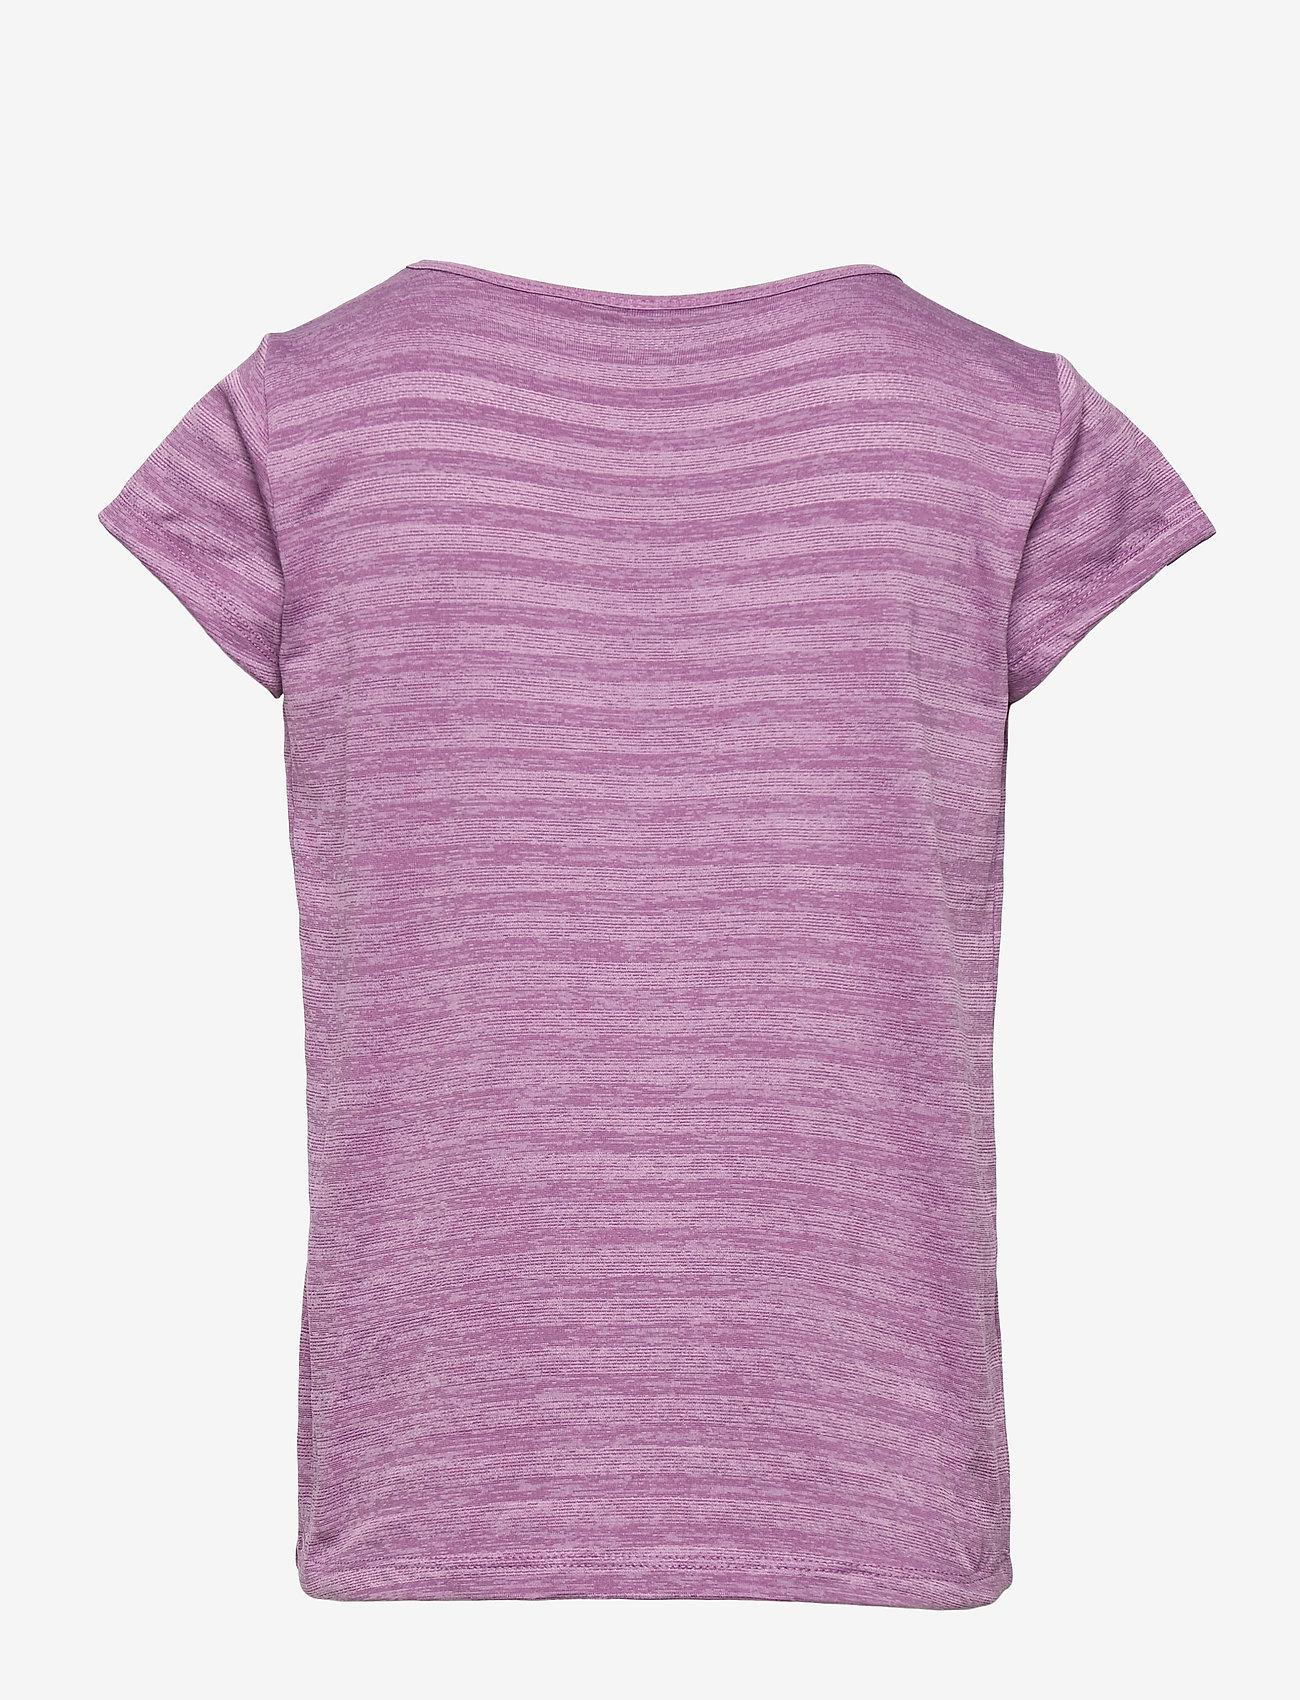 Hummel - hmlSUTKIN T-SHIRT S/S - short-sleeved - chinese violet - 1